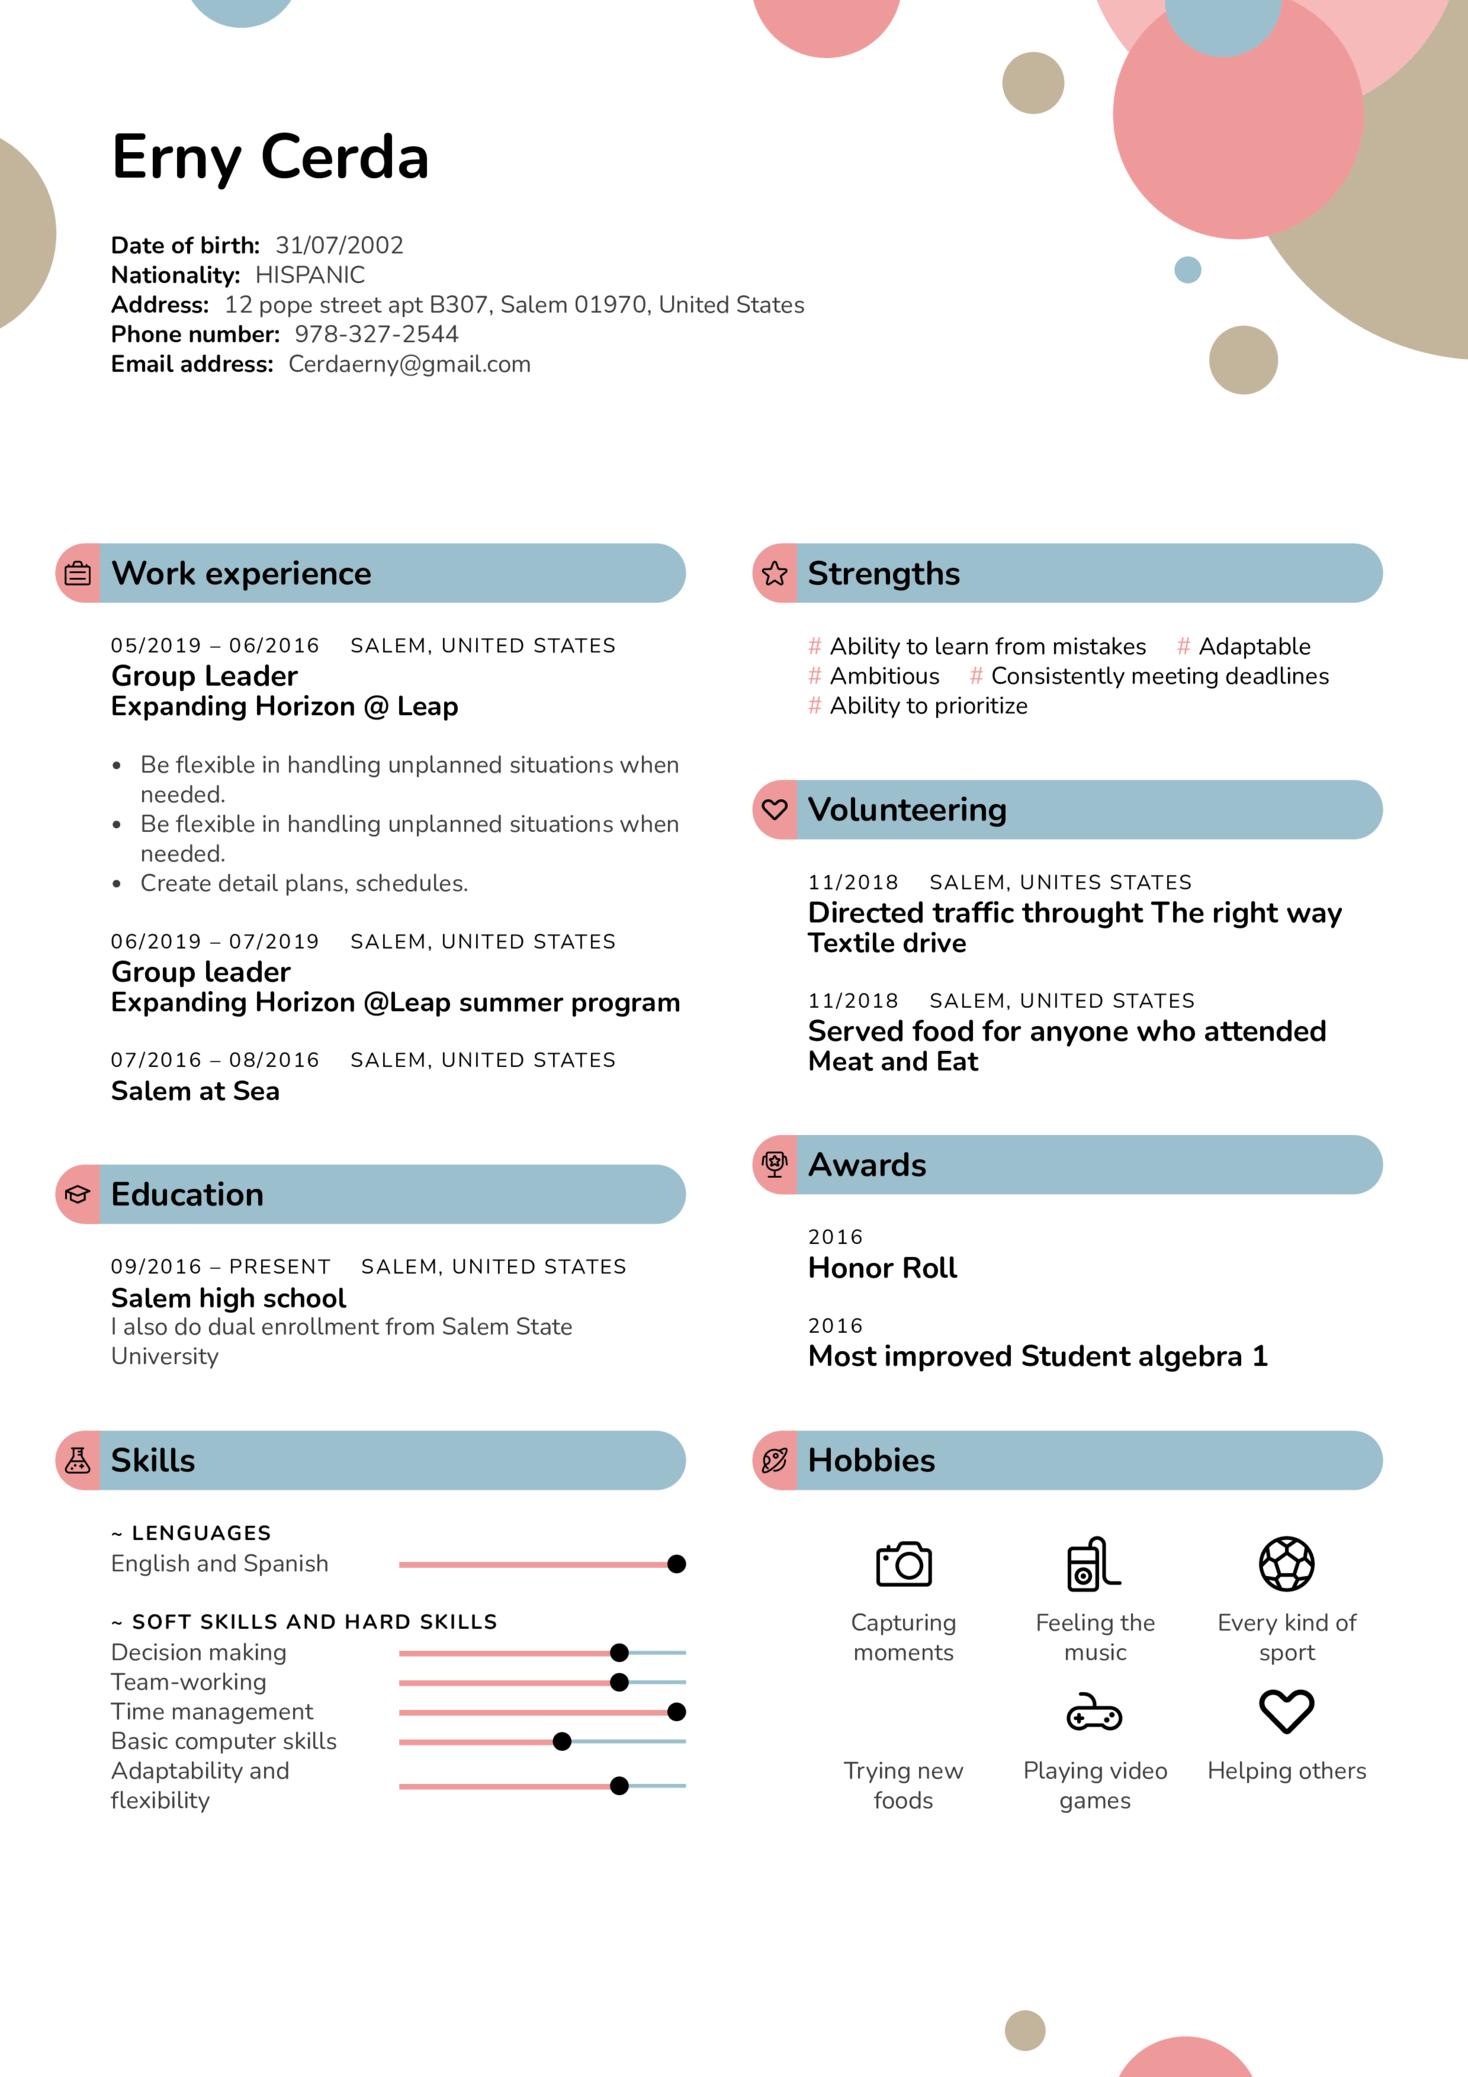 Group Leader at Expanding Horizon Resume Sample (Part 1)